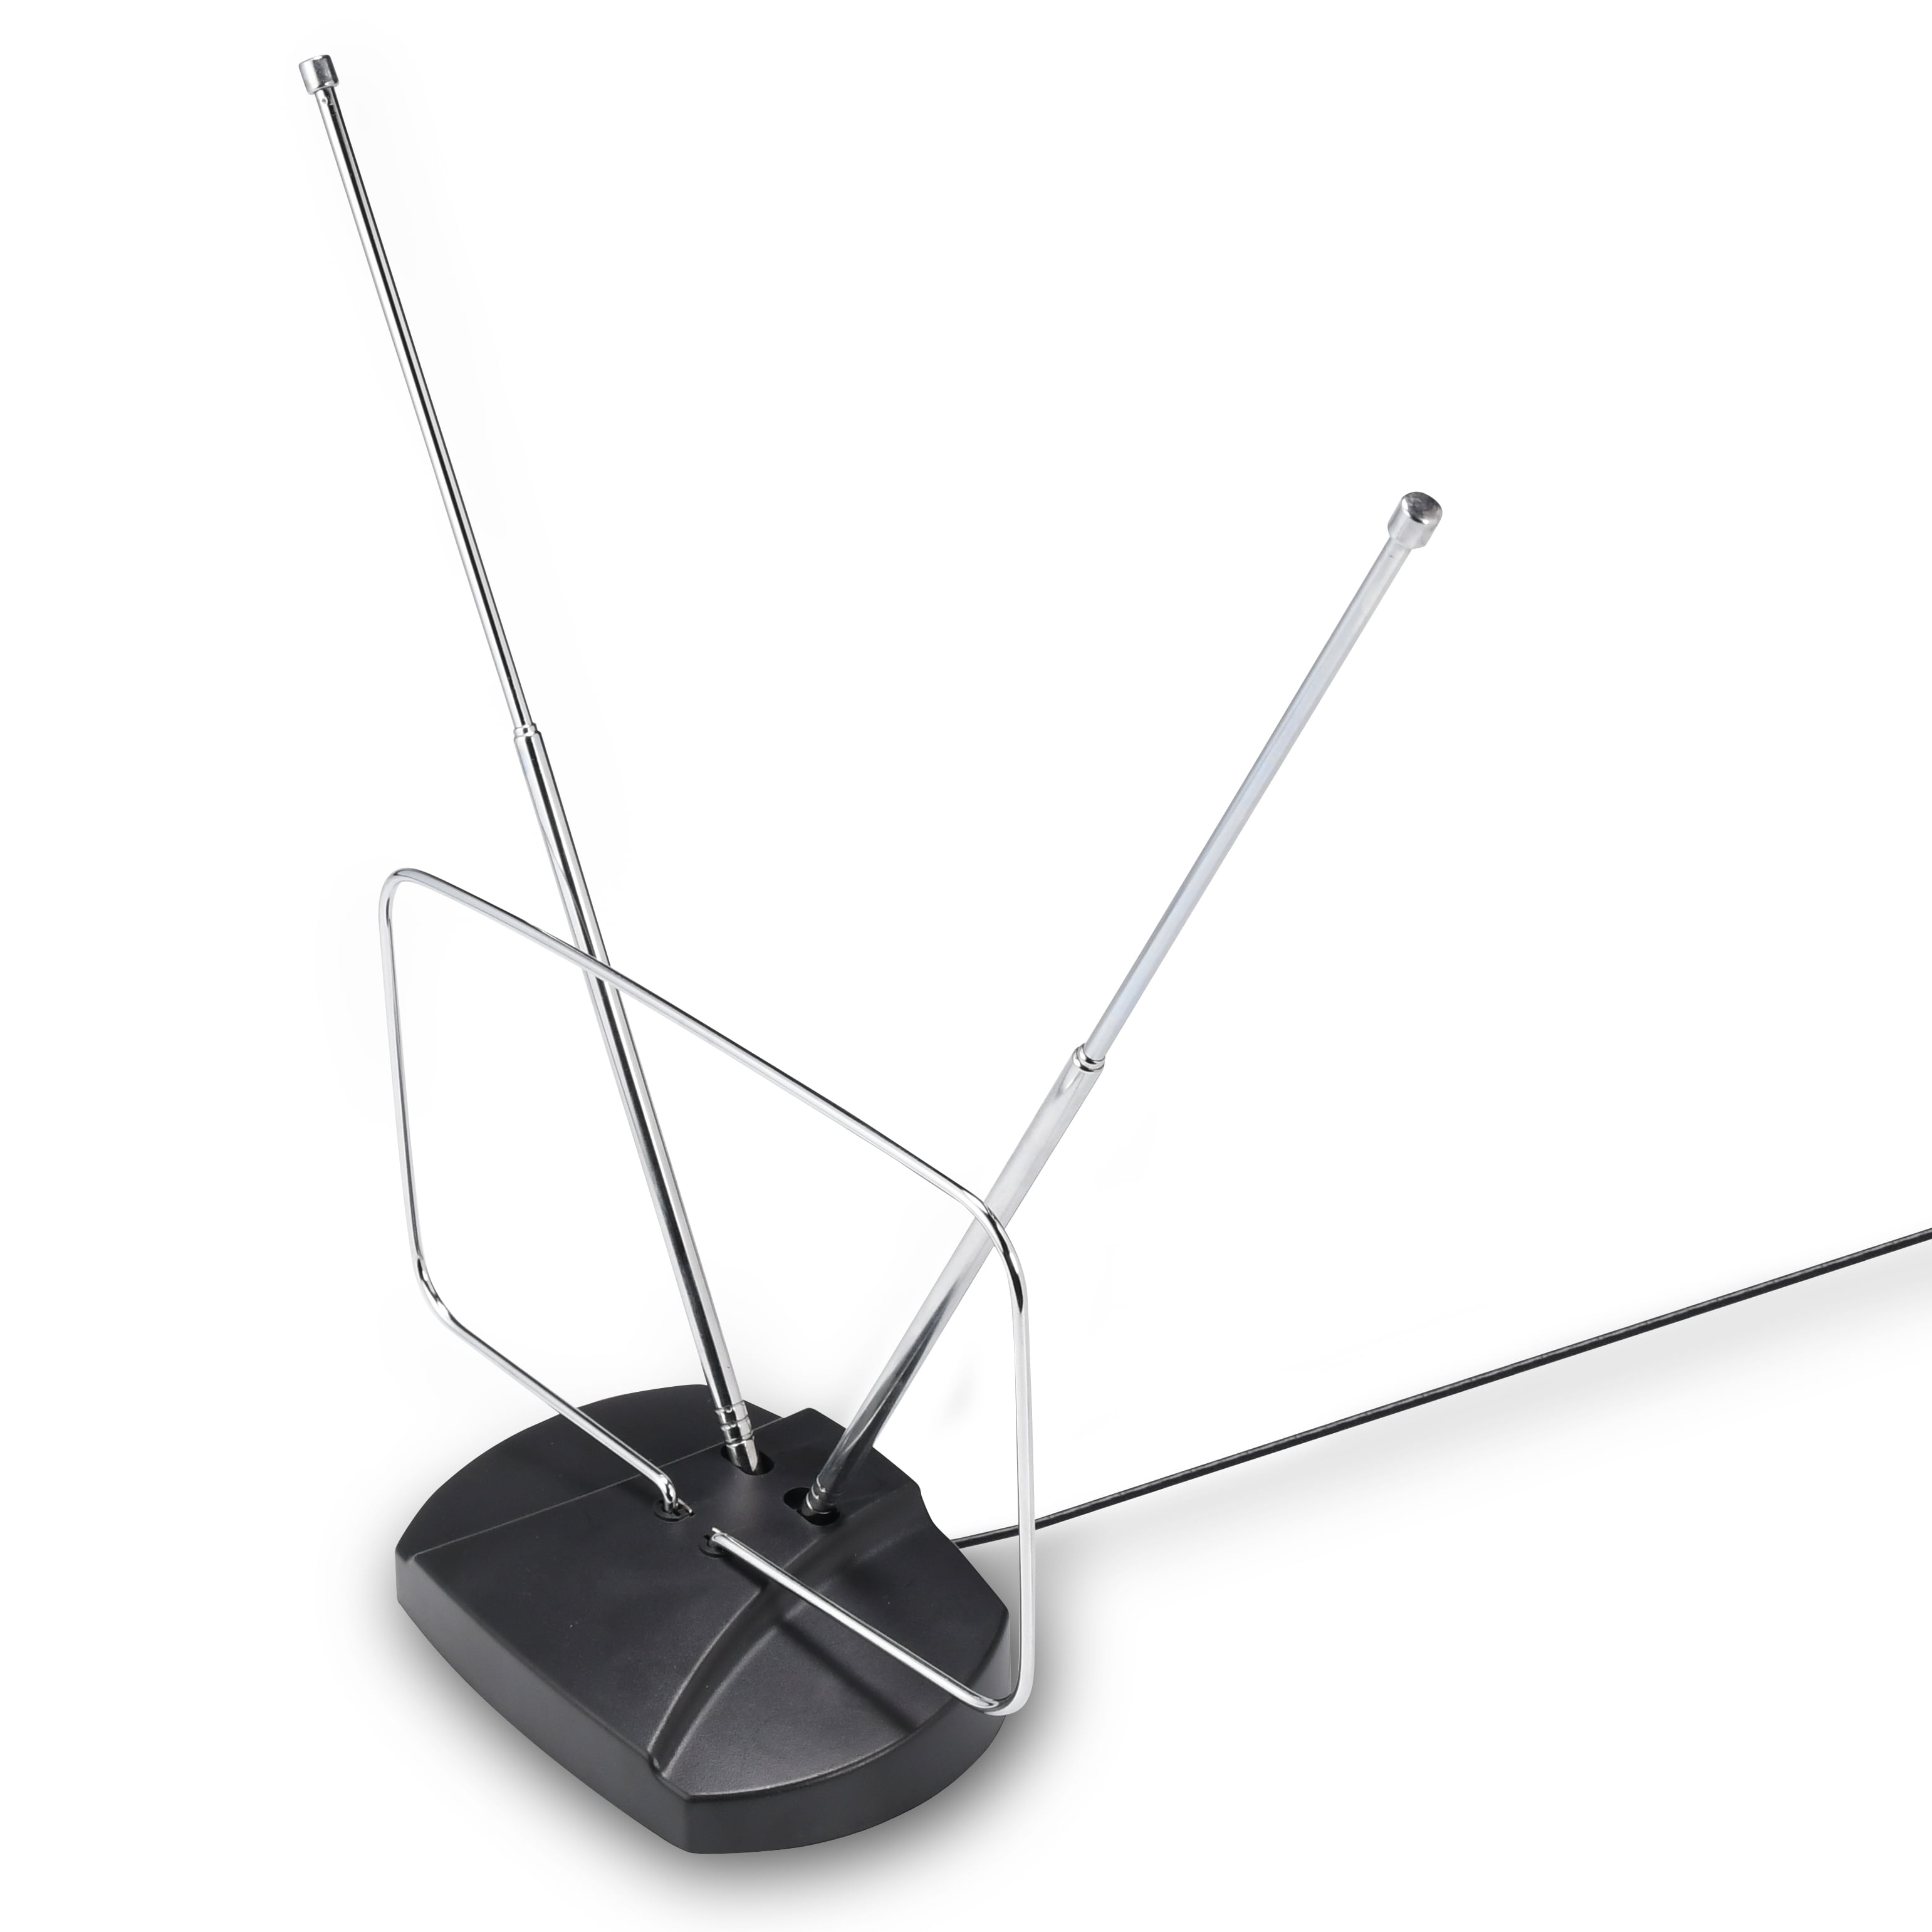 Onn Indoor High Quality Hdtv Antenna Walmartcom